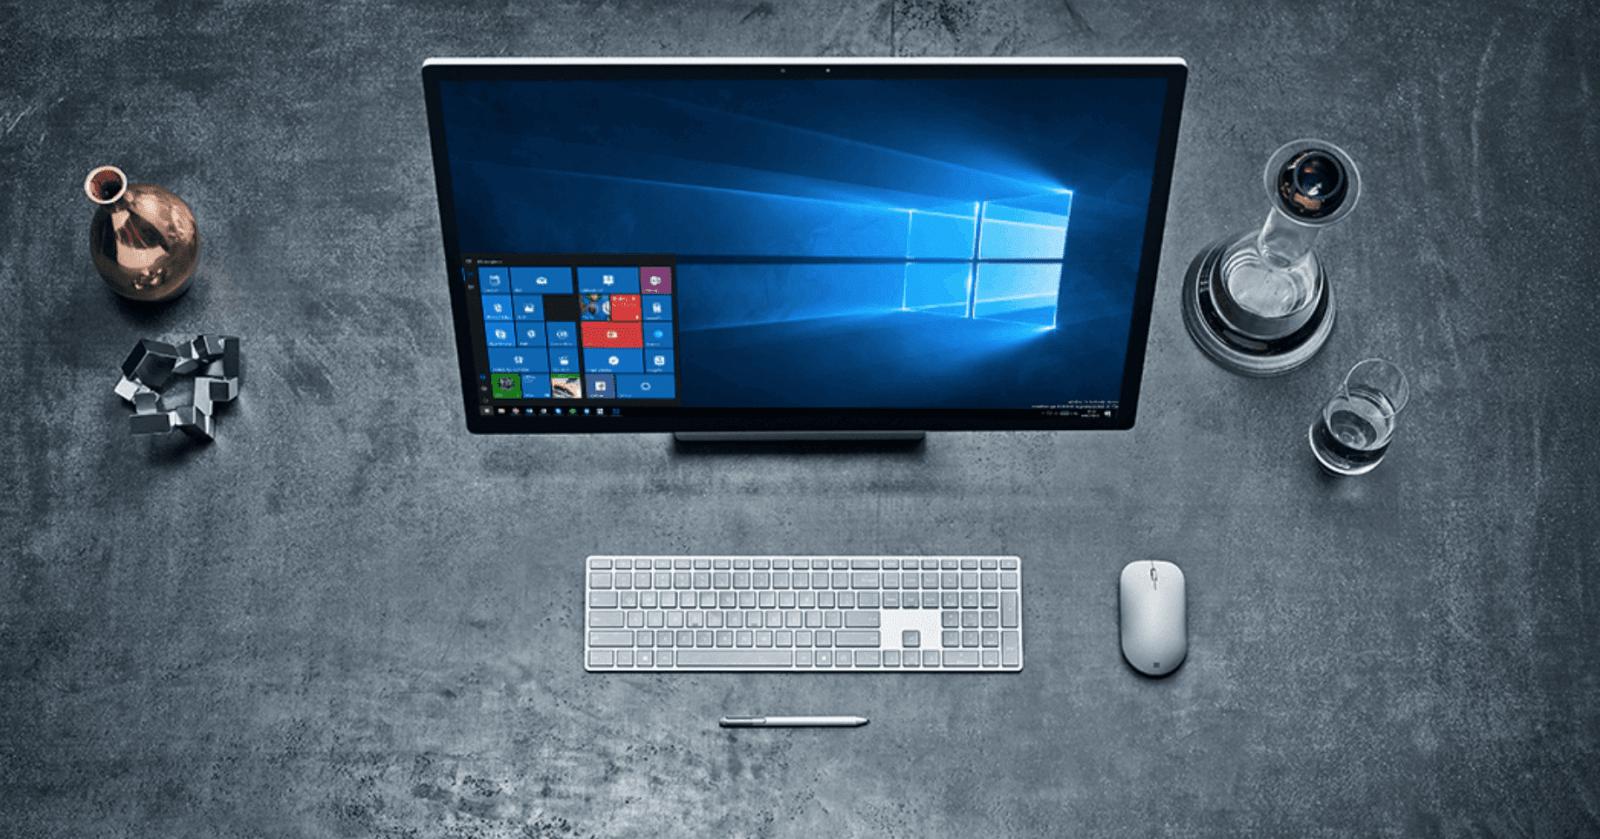 Windows 10 Creators Update cumulative update - Пользователи вместо покупателей. Авторская колонка Александра Баулина